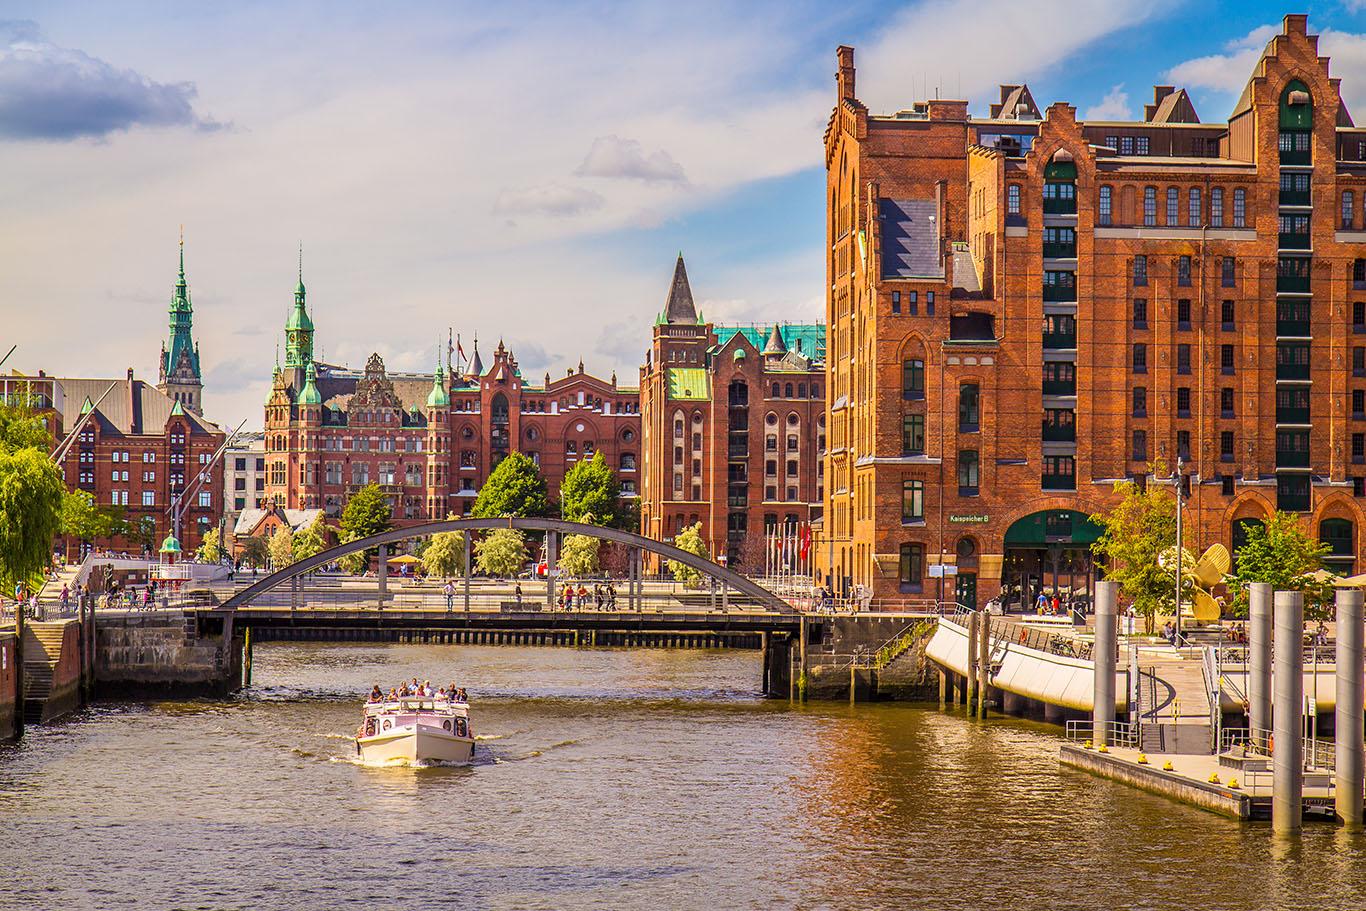 Billige Hotels In Hamburg Zentrum